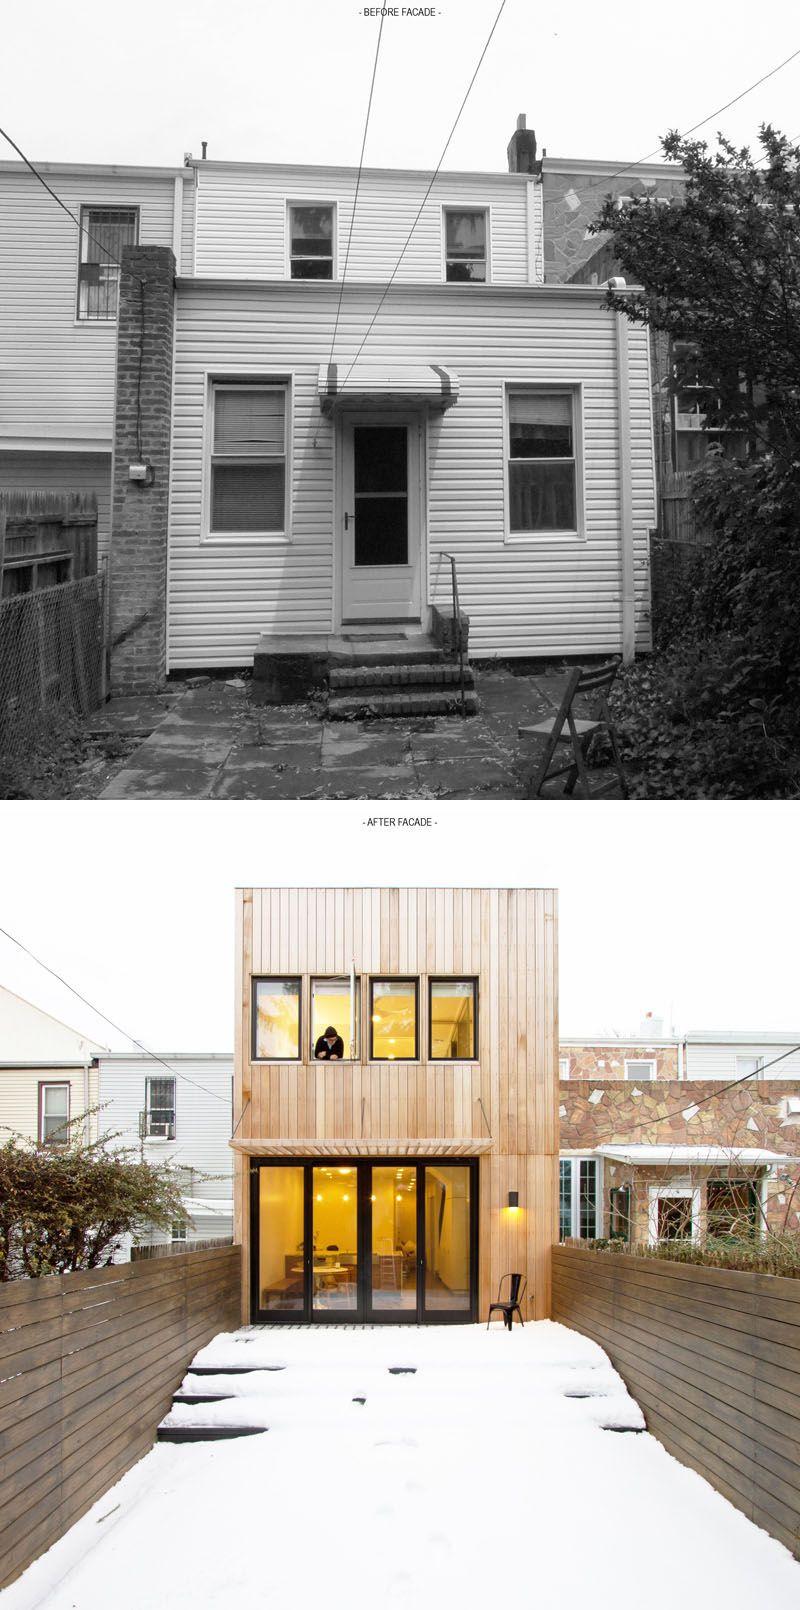 House Renovation Ideas 17 Inspirational Before